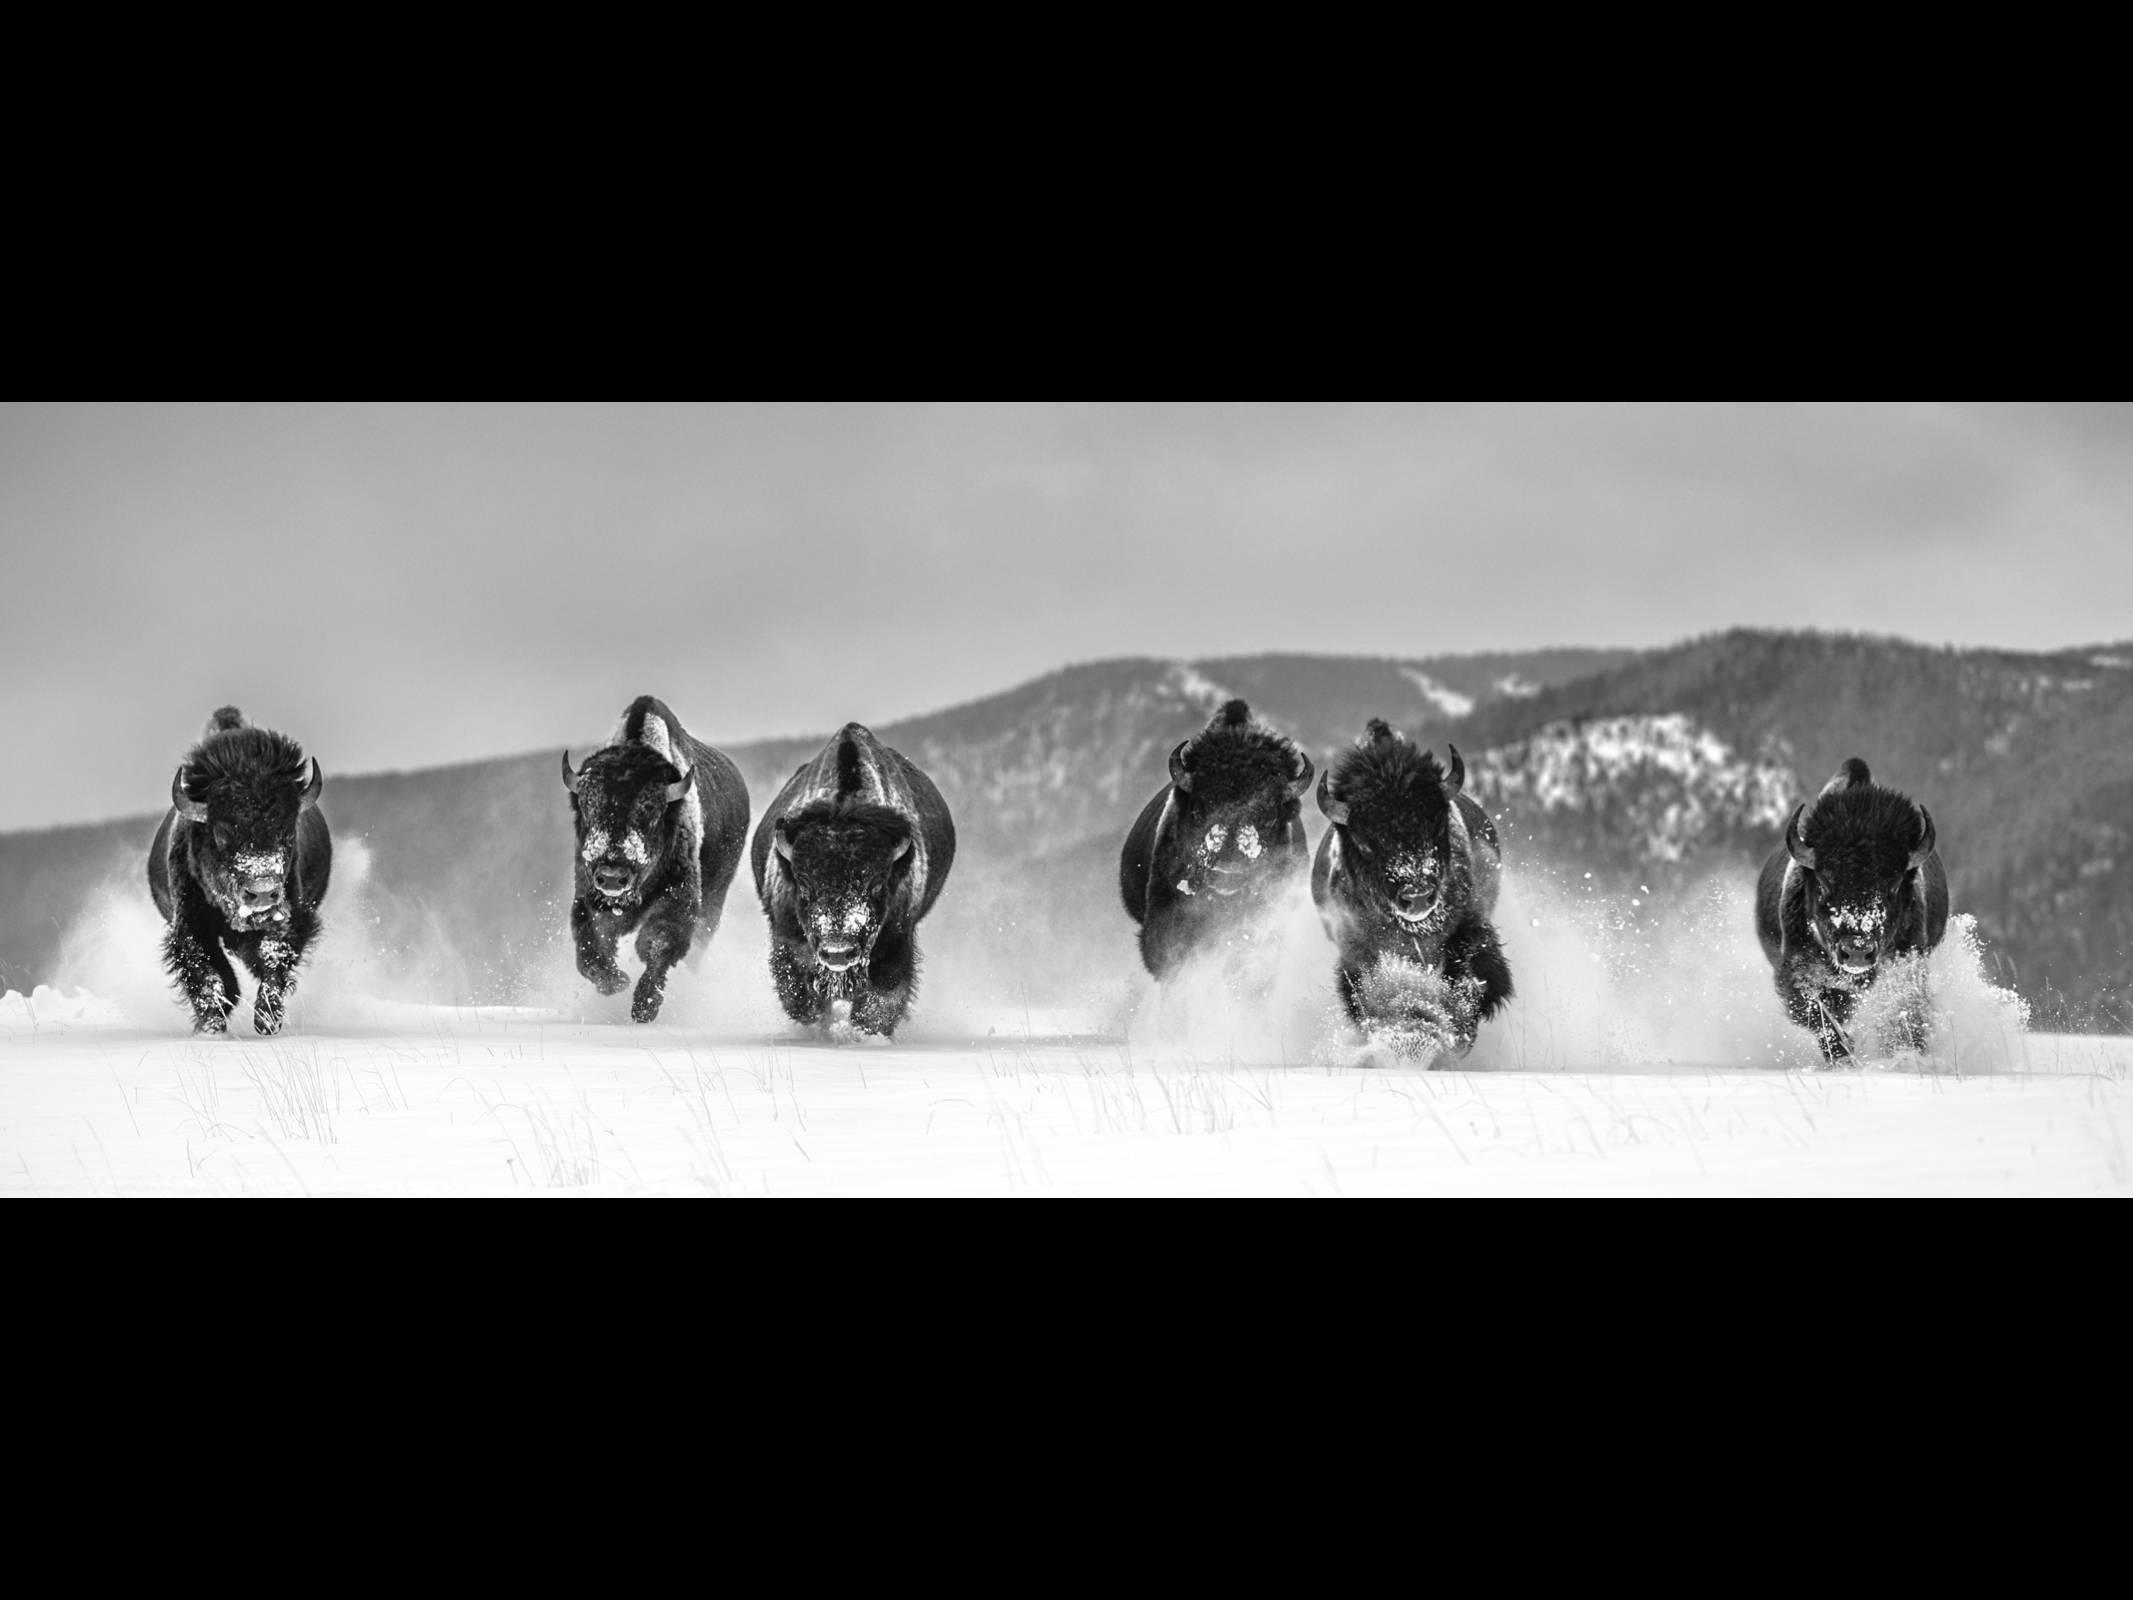 David Yarrow Photography. Wild West Series. Sorrel Sky Gallery. Buffalo running in snowy montana